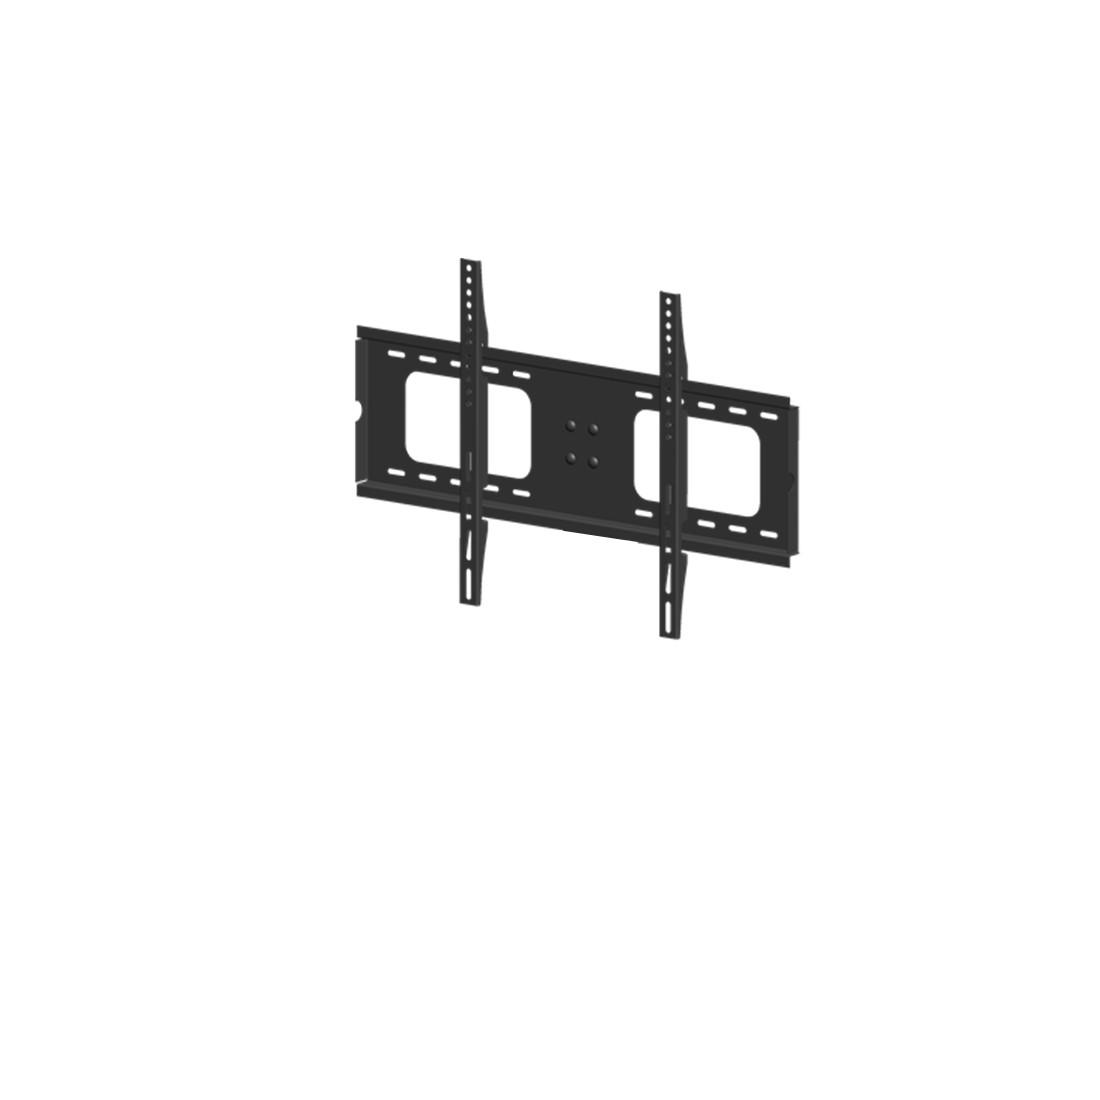 Кронштейн для монитора Dahua DHL32-S200/42/43/49/55-BG (Металл)